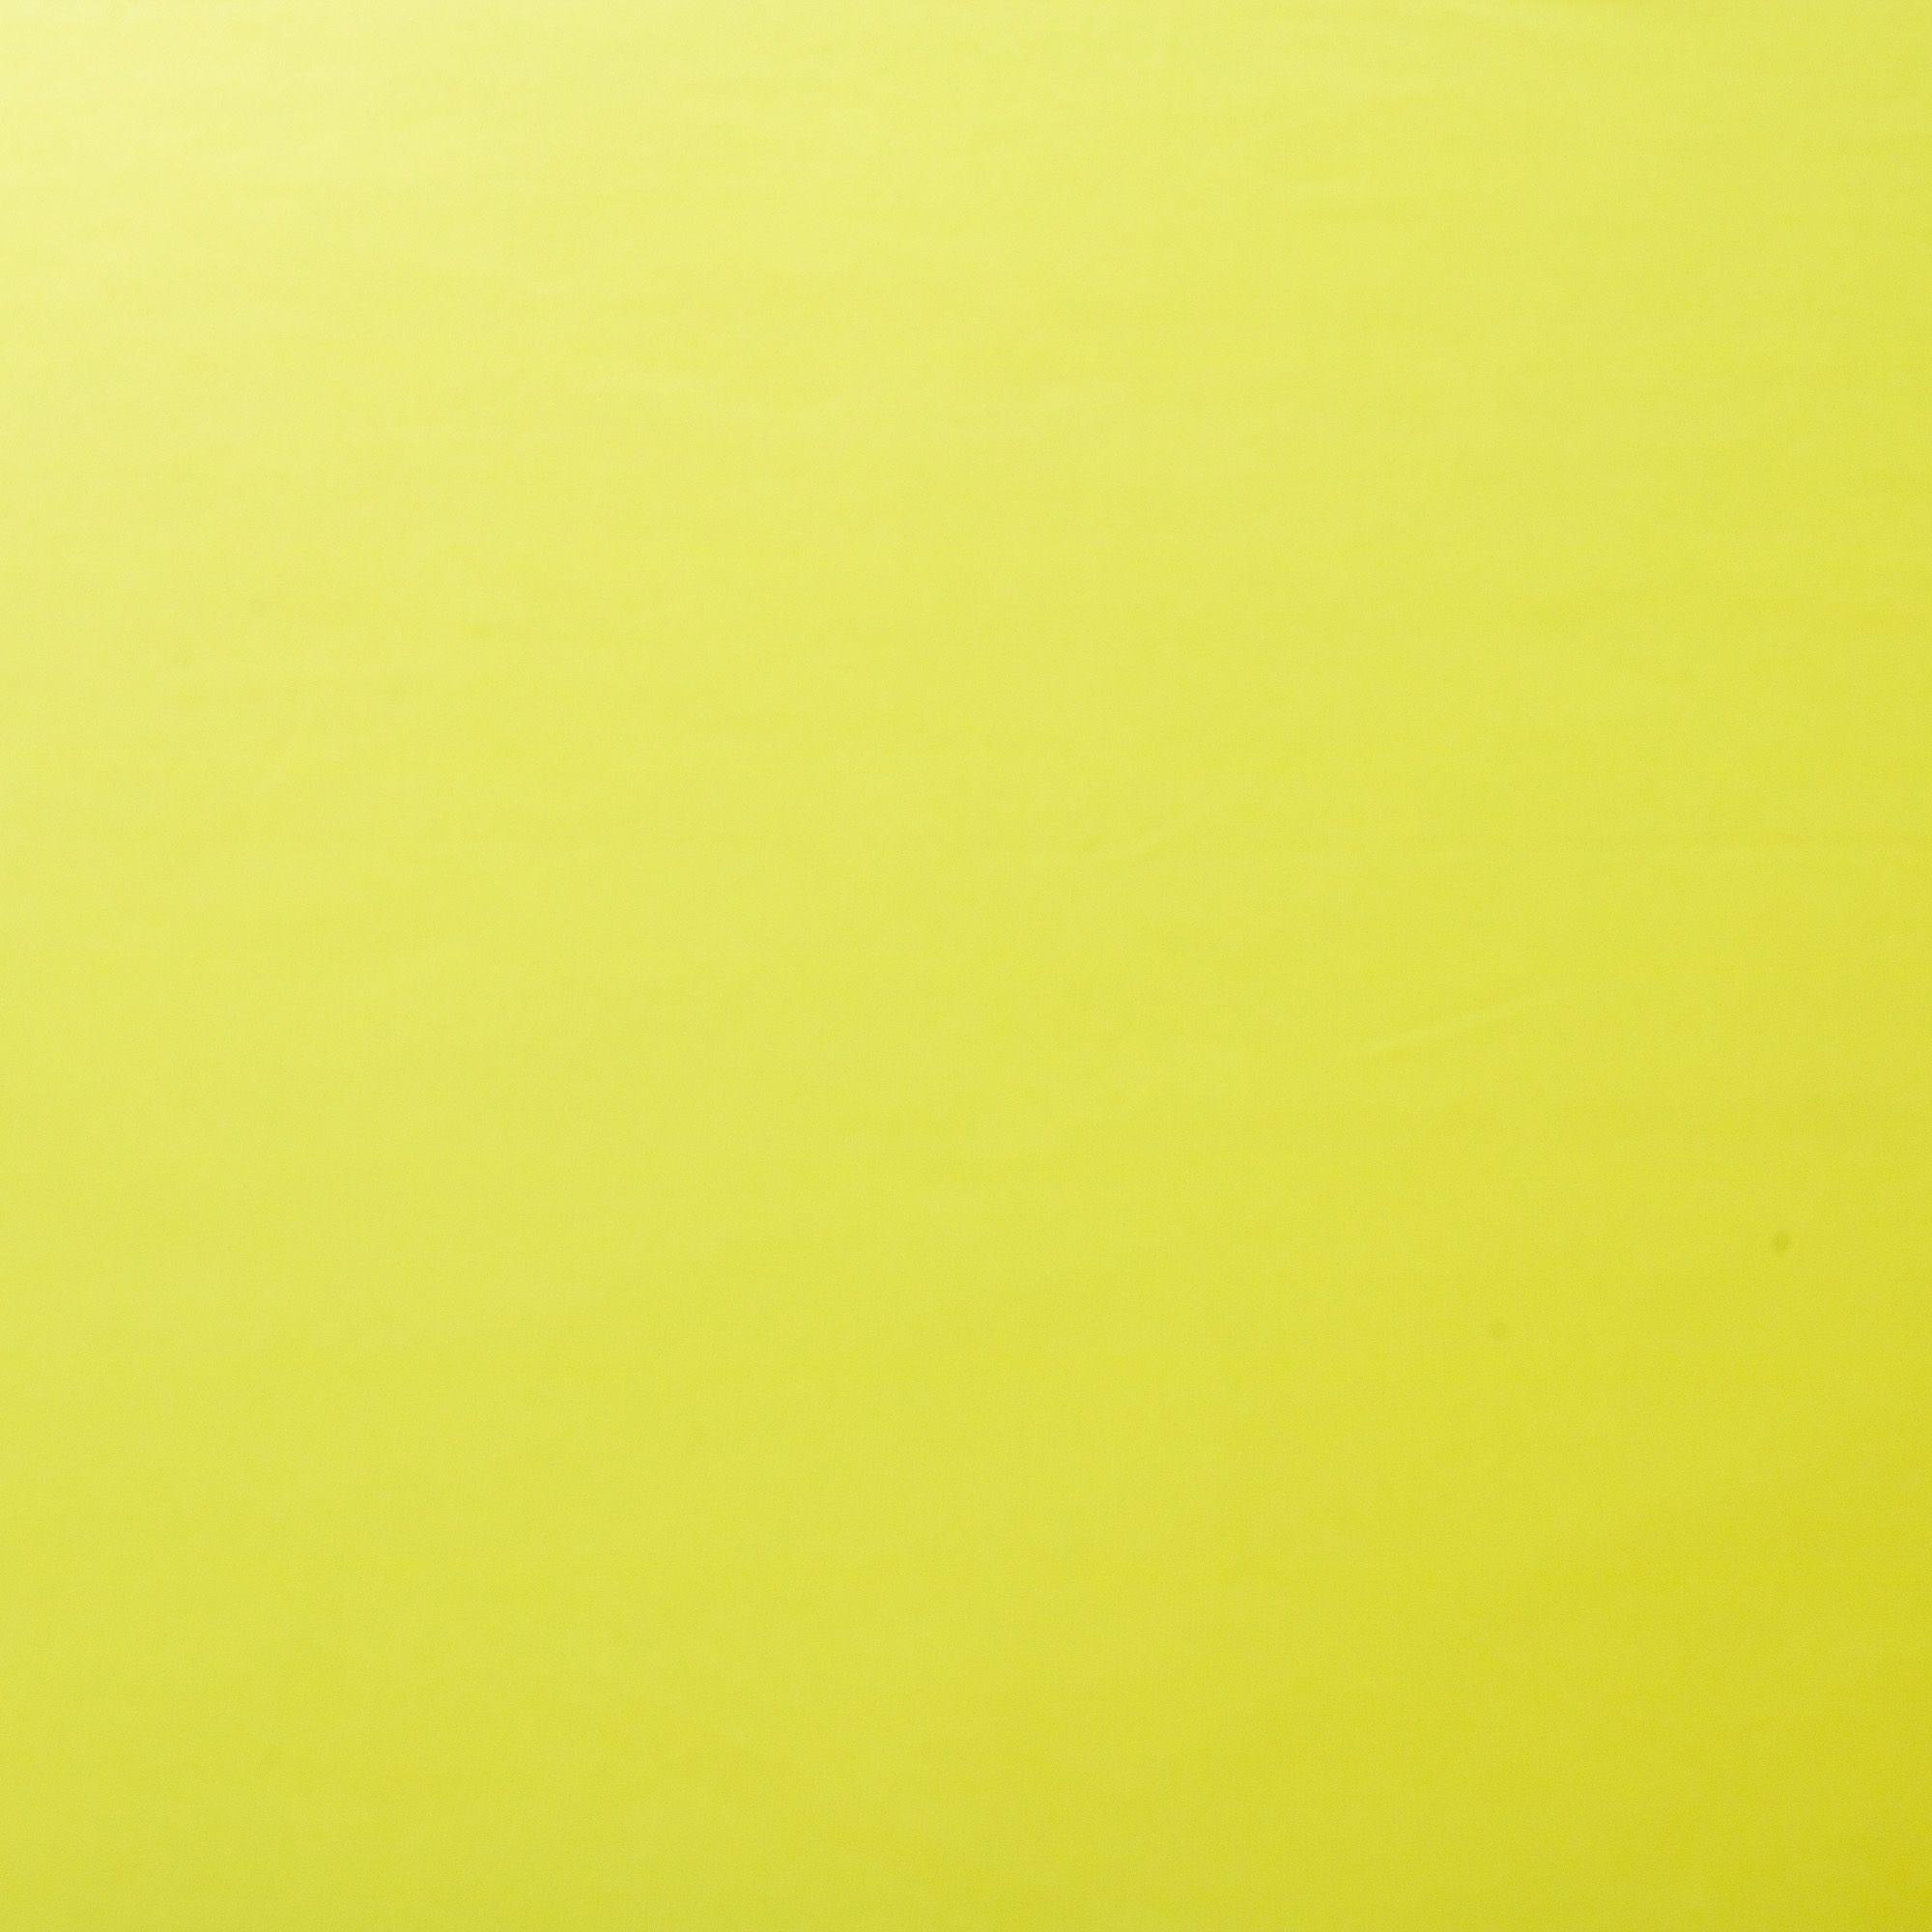 Tecido Malha Helanca Light Amarelo Neon 100% Poliester 1,80 mt Largura